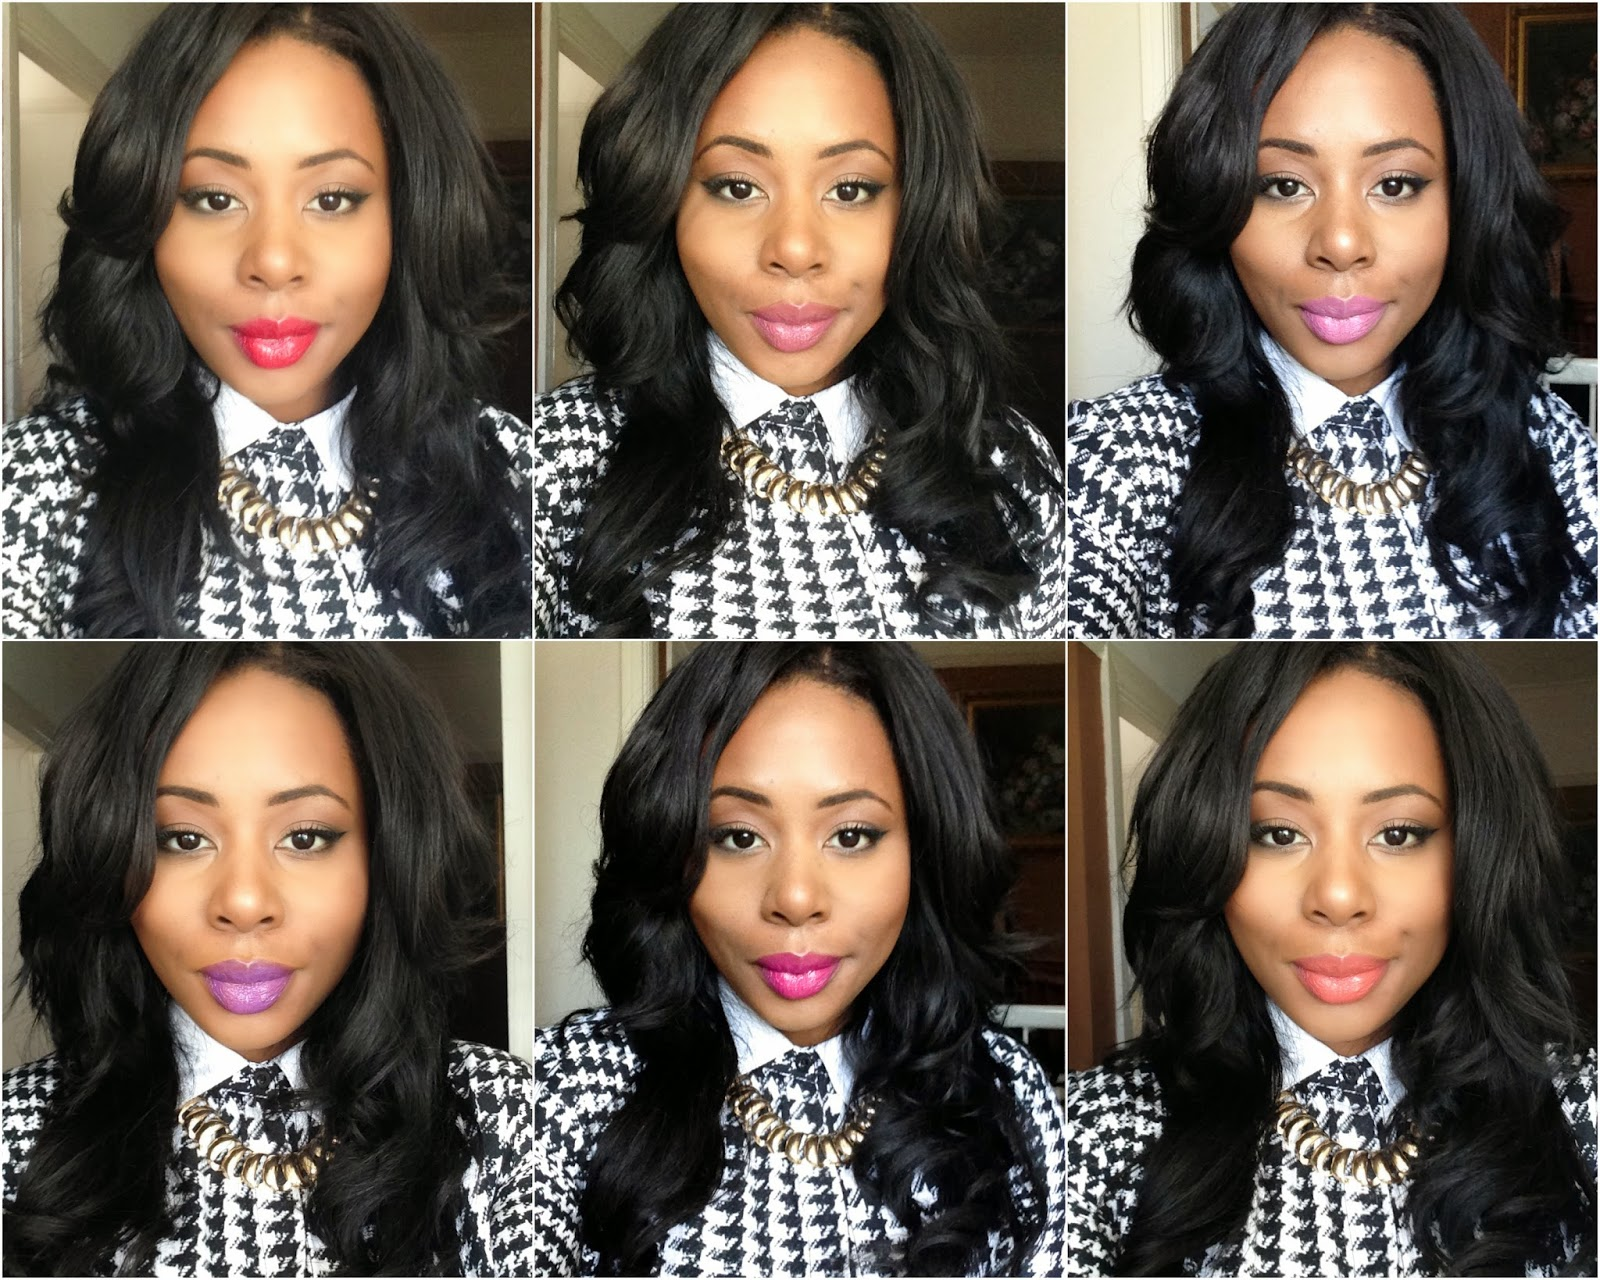 LA Girl Glazed Lip Paints Discoveries Of Self Blog